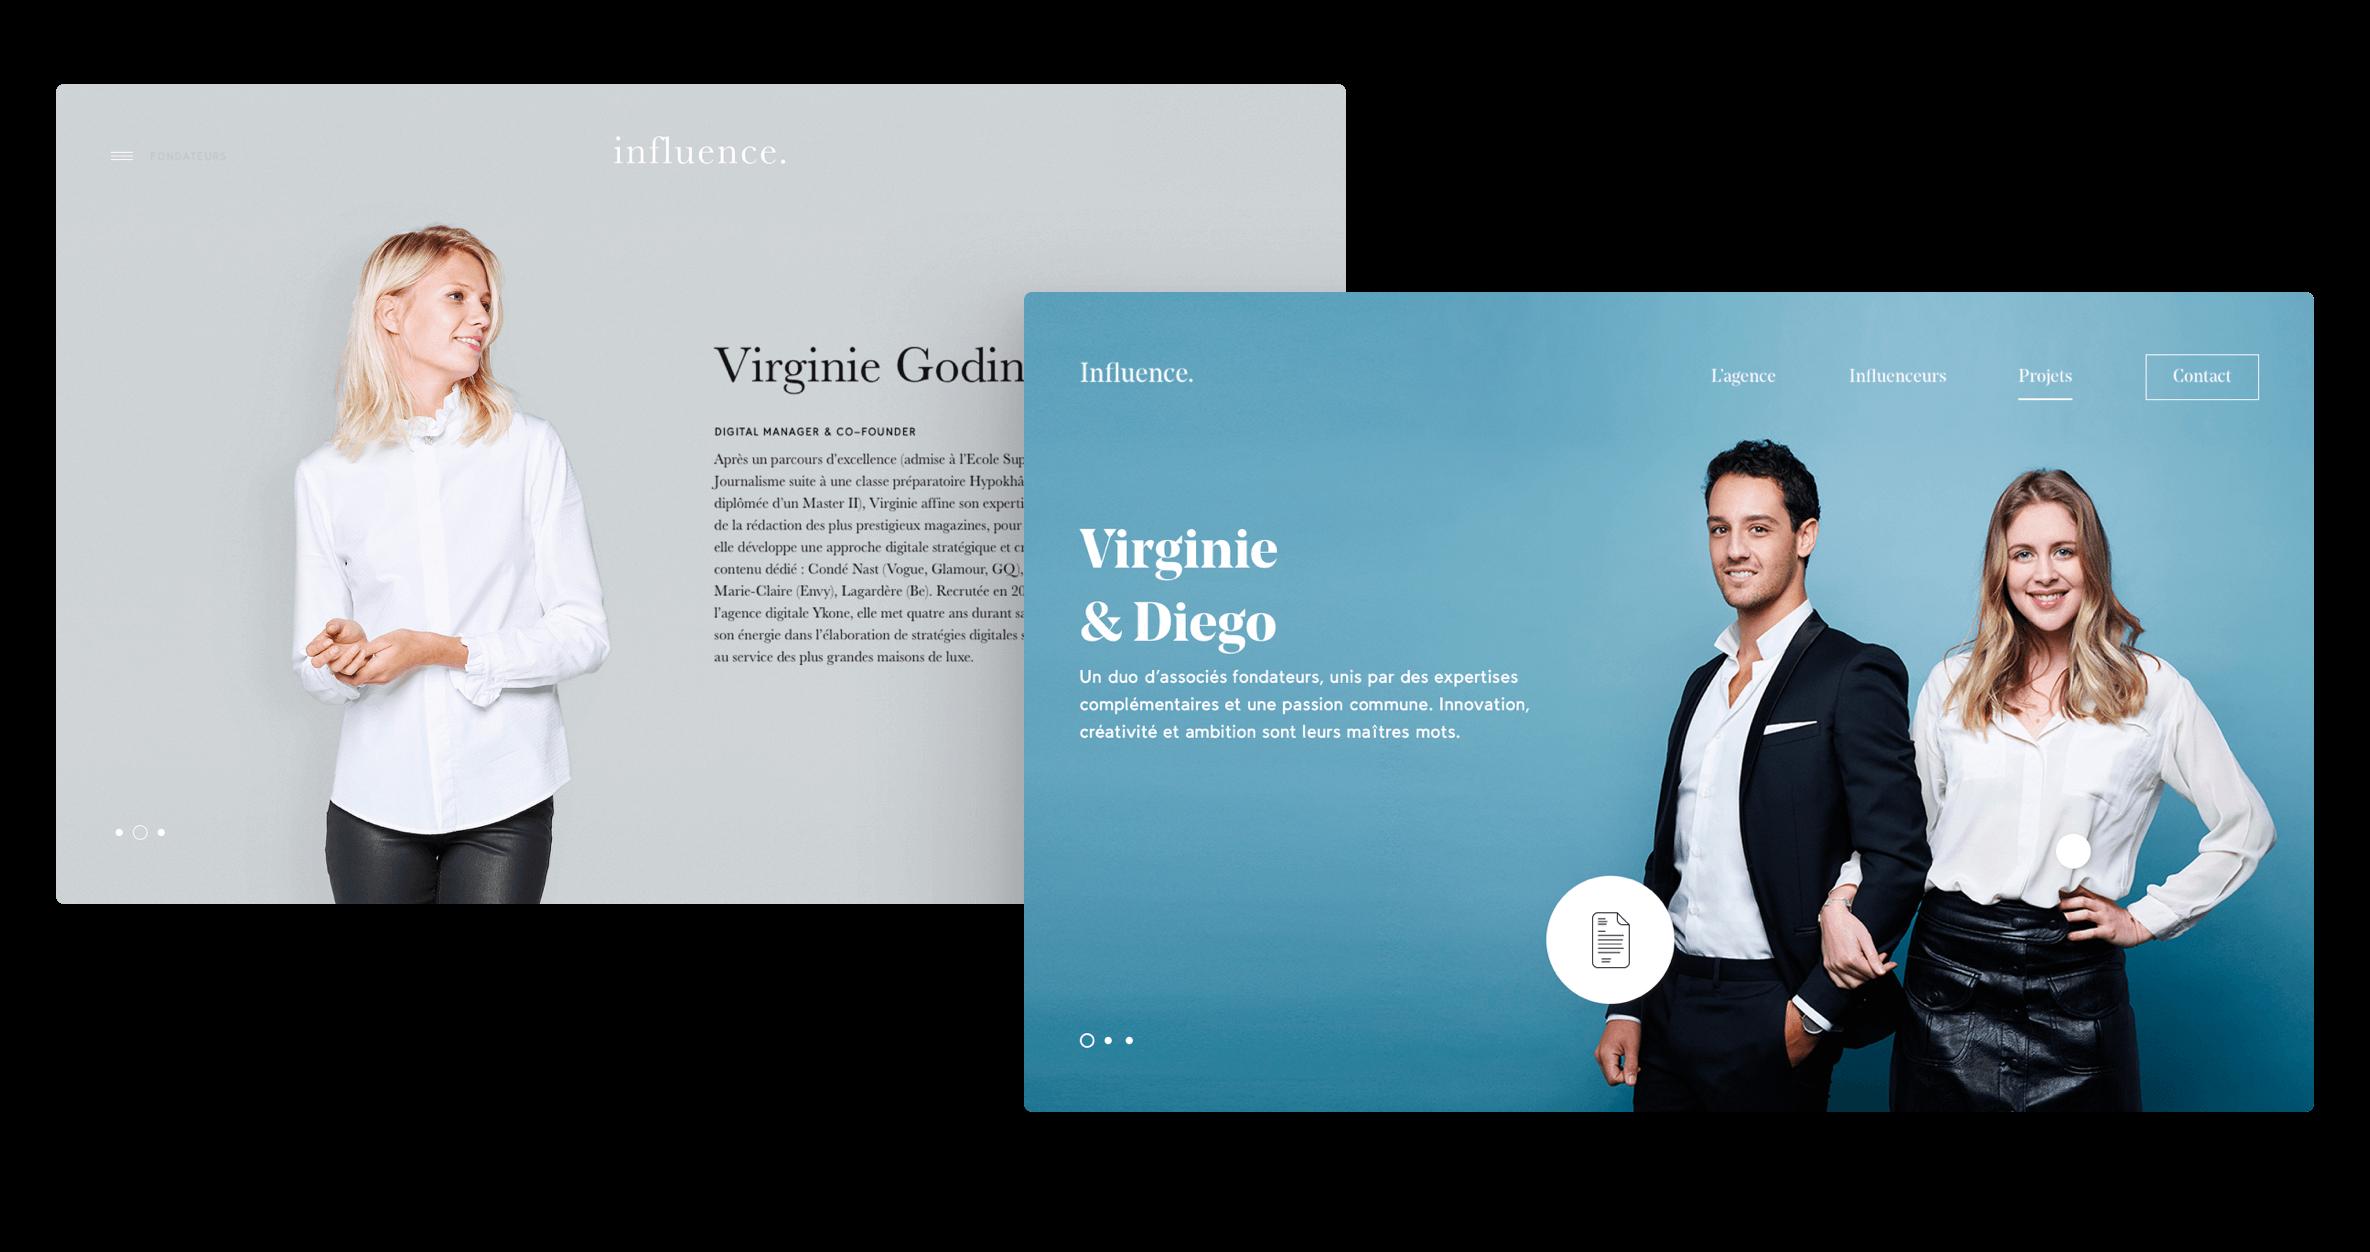 projet_influence-robin_p-designer_04@2x